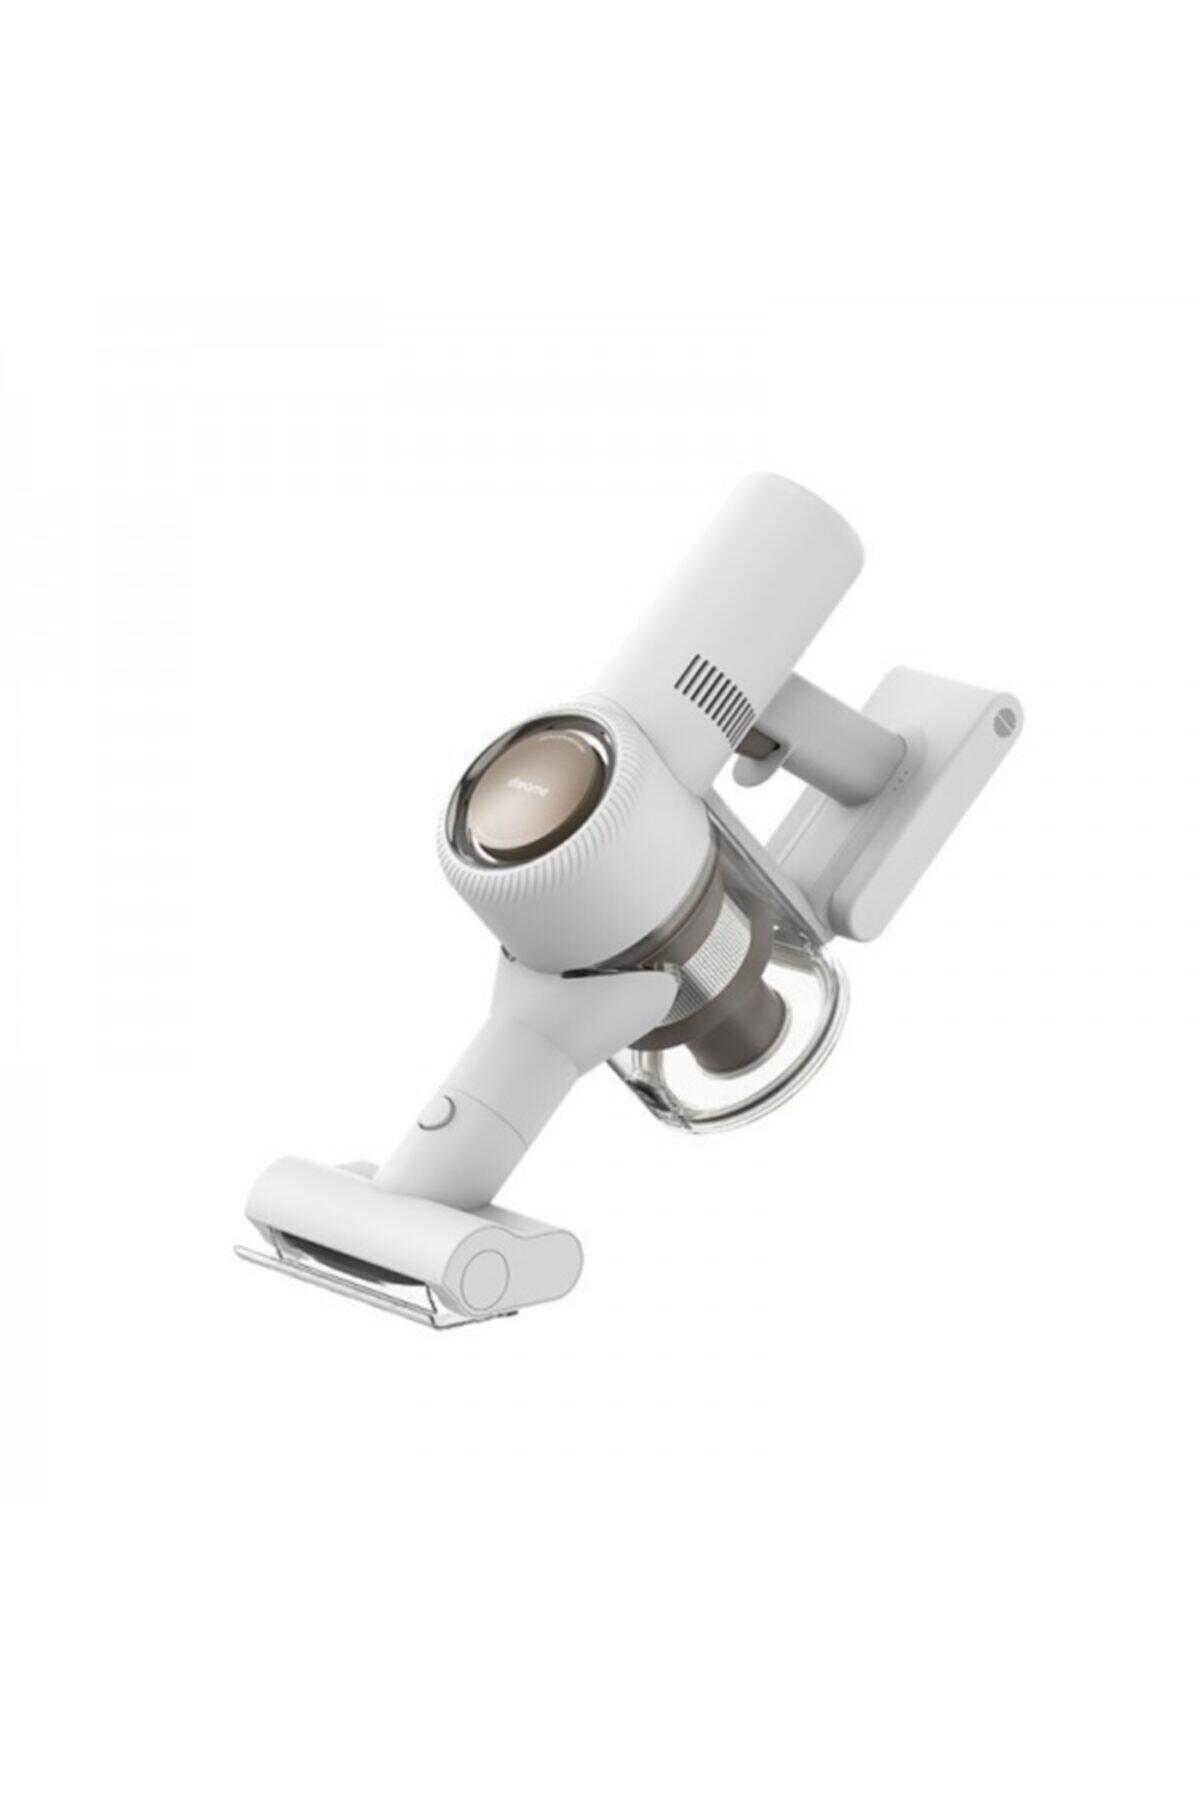 Dreame V10 Pro Akülü Elektrikli Dikey Süpürge (GENPA GARANTİLİ) 2